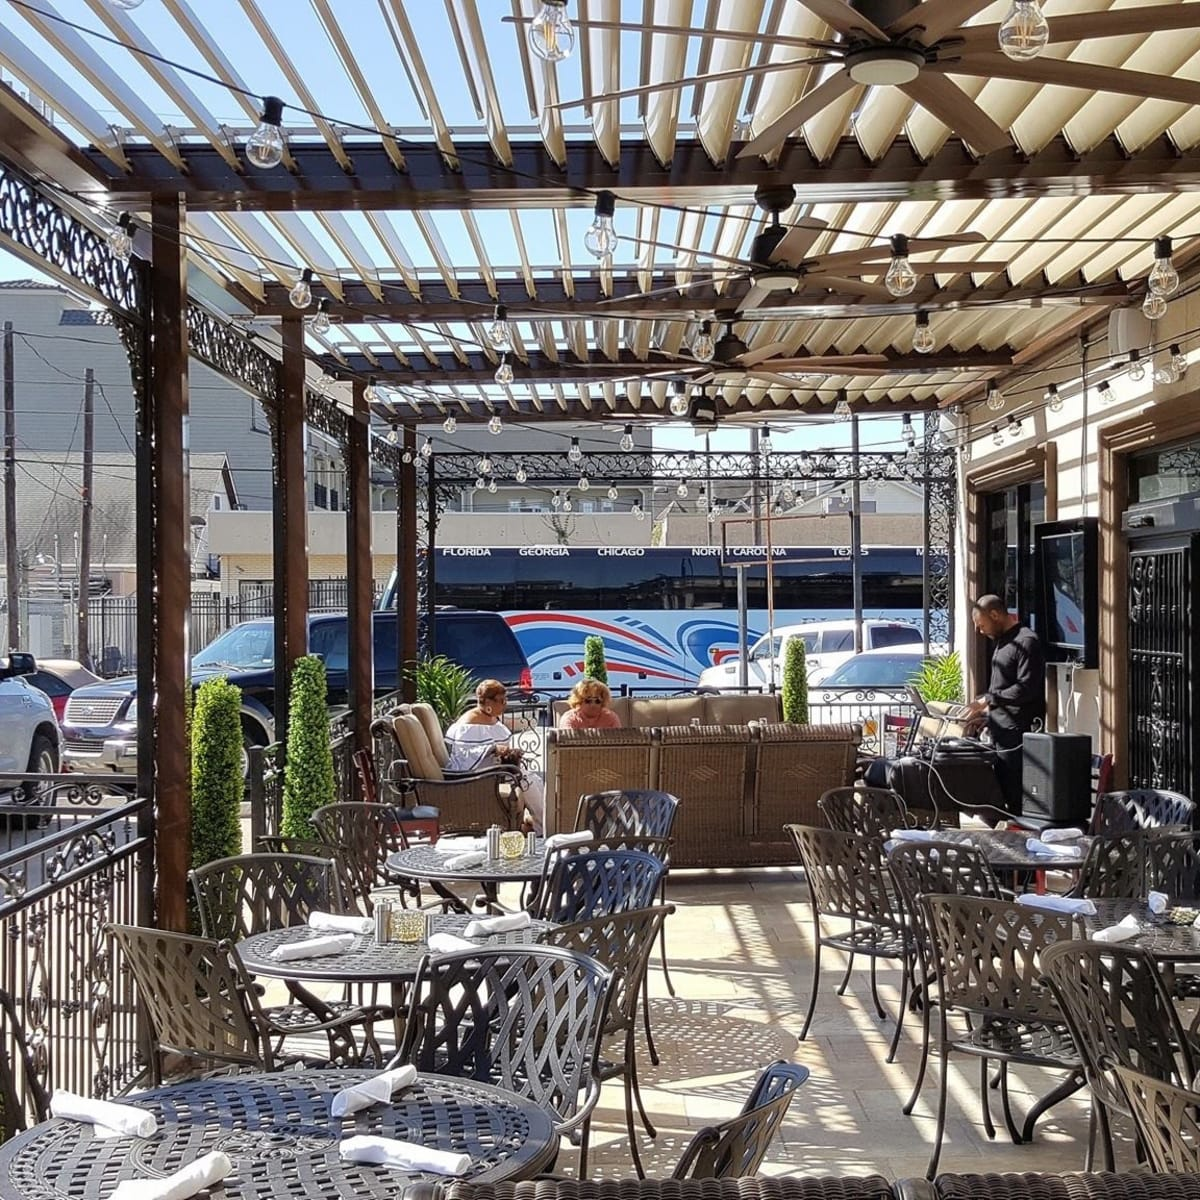 Where To Eat During Houston Black Restaurant Week: 5